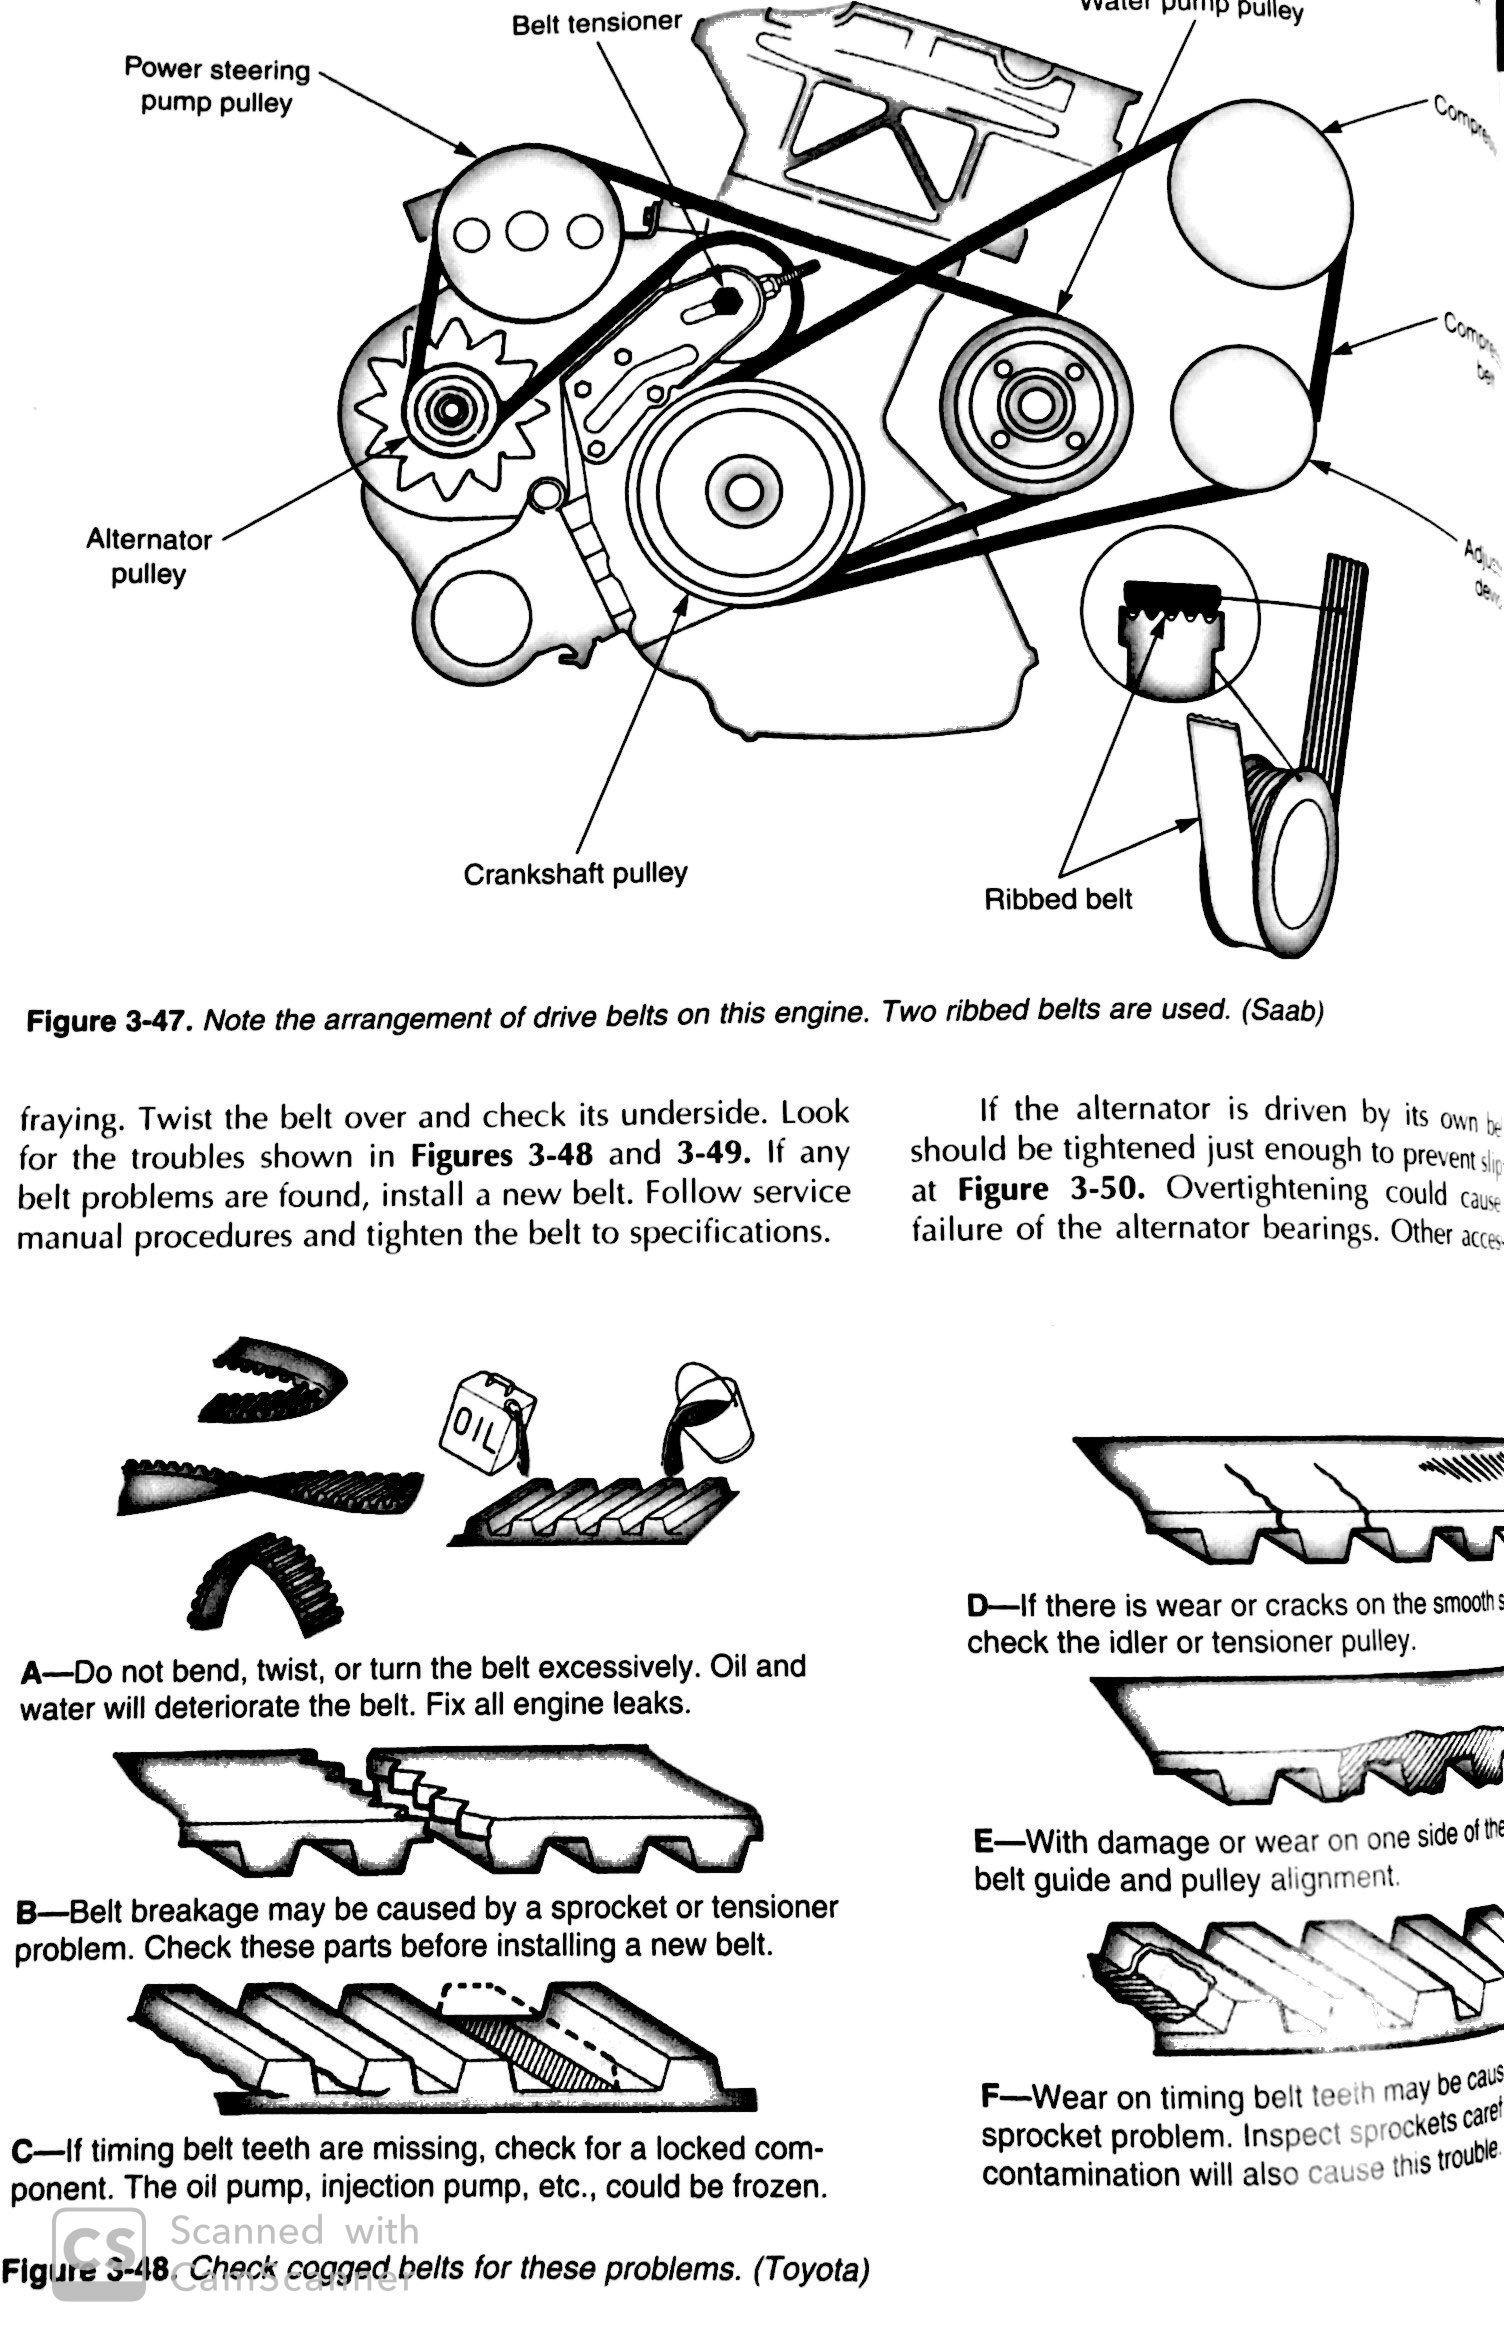 Pin By Eldrid Boraine On Automotive Repairs Automotive Repair Auto Repair Repair